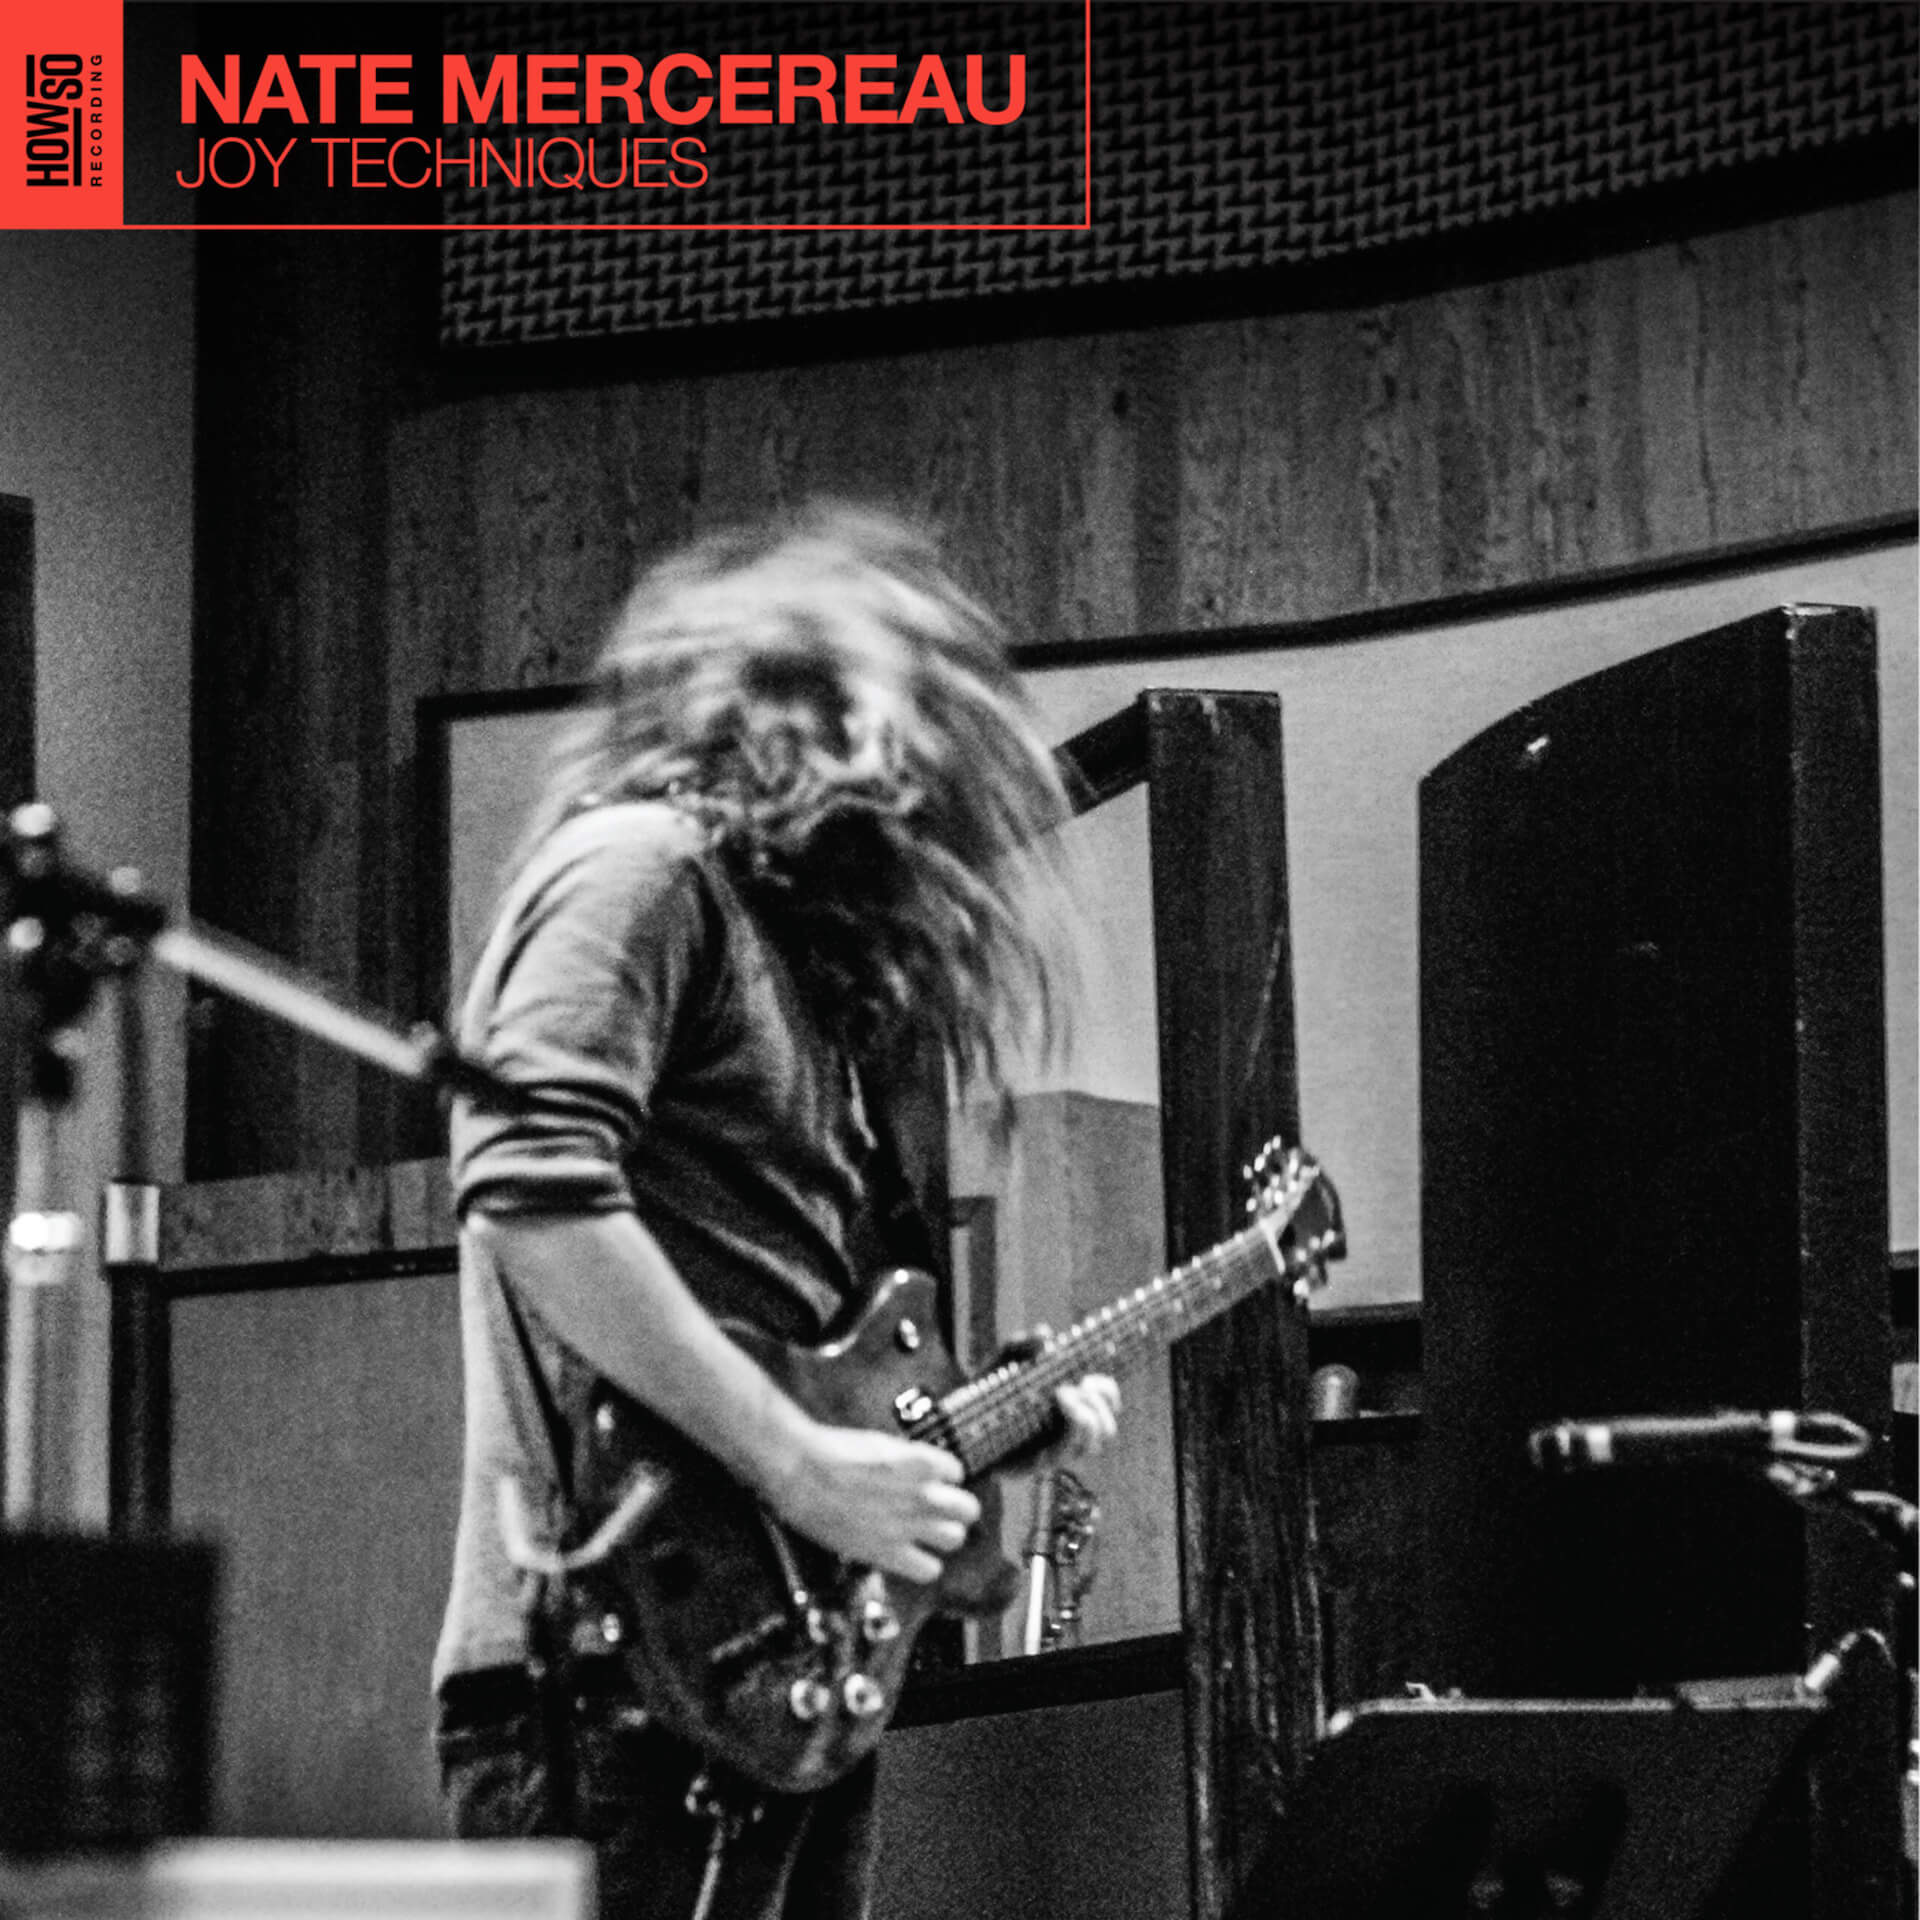 Nate Marcereau初のアルバム『Joy Techniques』が本日リリース Terrace Martinも客演参加 music200925_natemarcereau_1